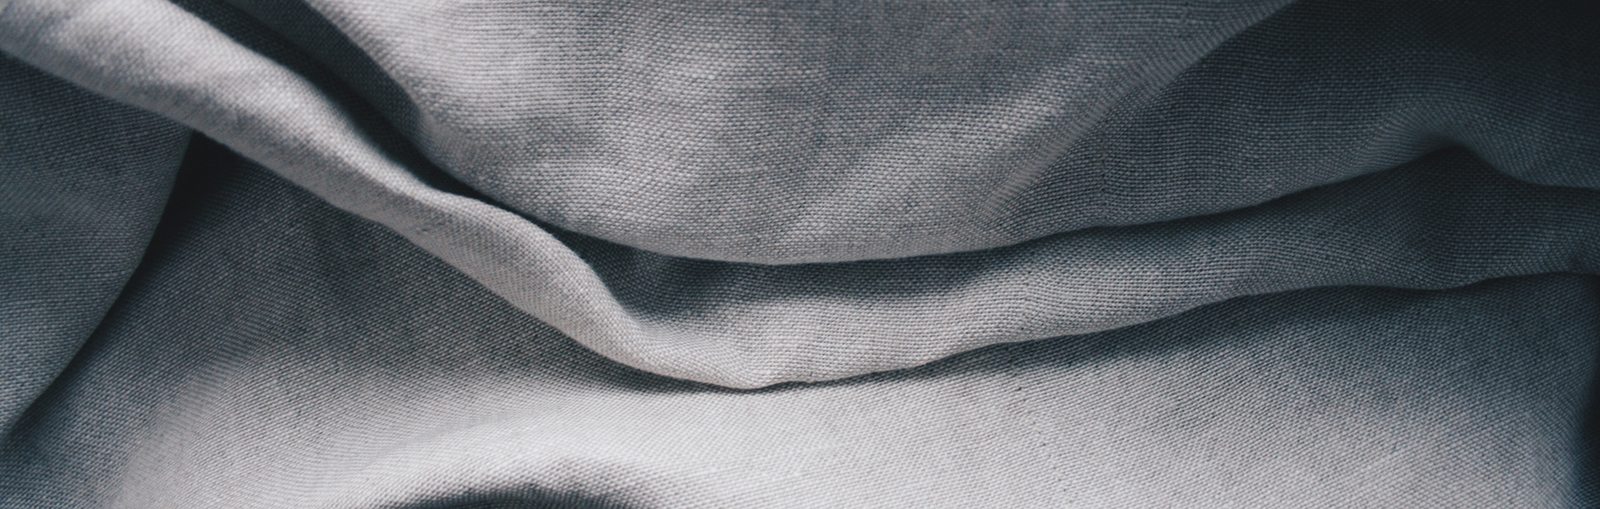 Clean fabric